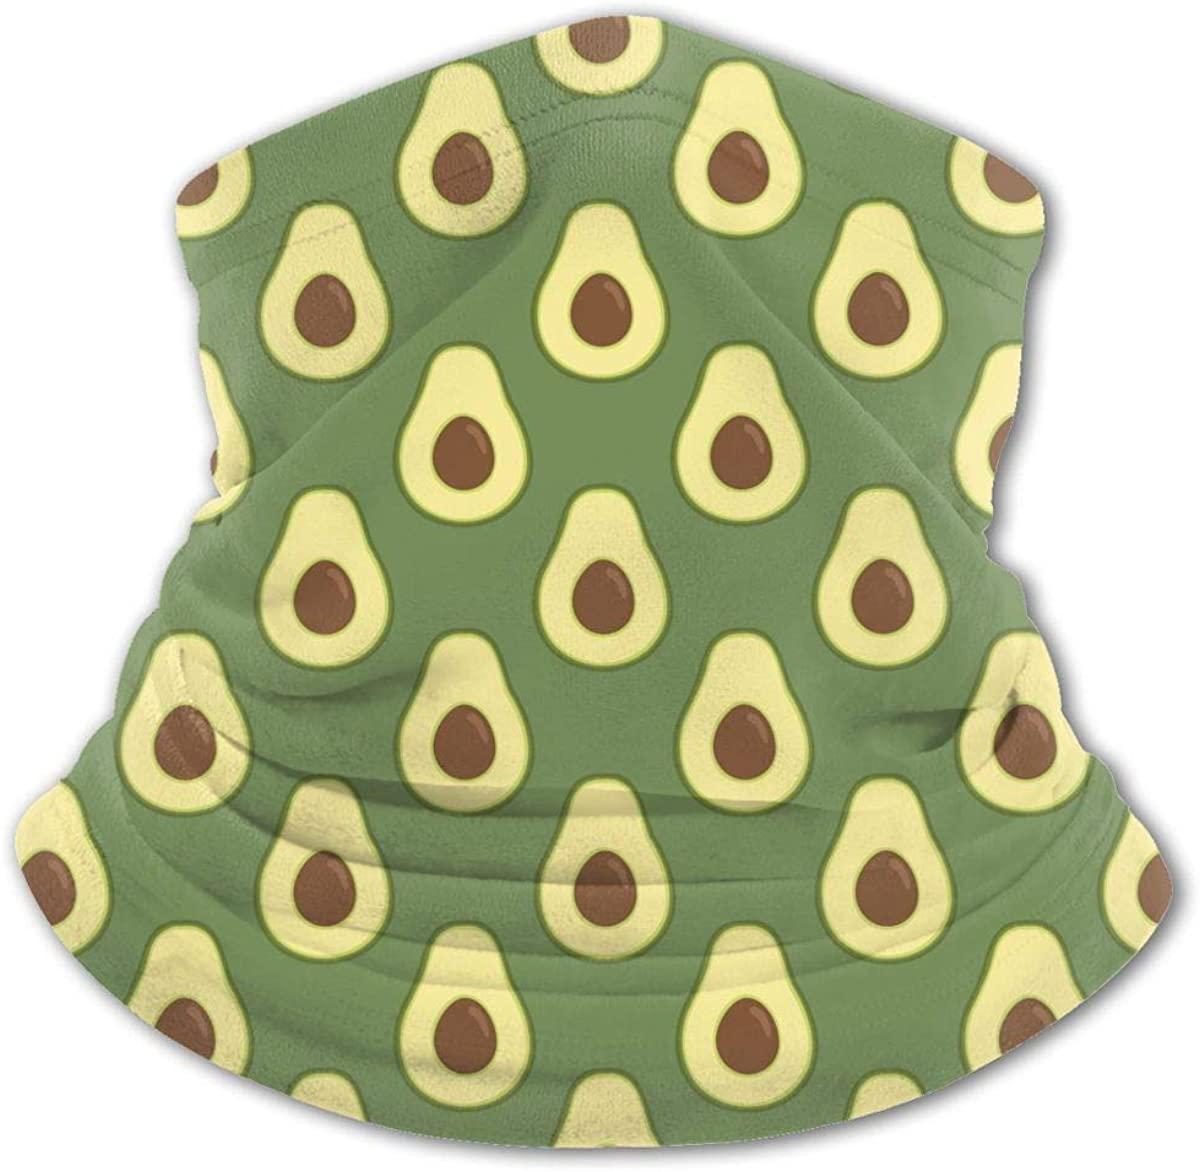 Avocado Bright Green Neck Gaiter Face Mask Bandana Dust Wind Sun UV Balaclava for Teen Boy Girl Outdoors